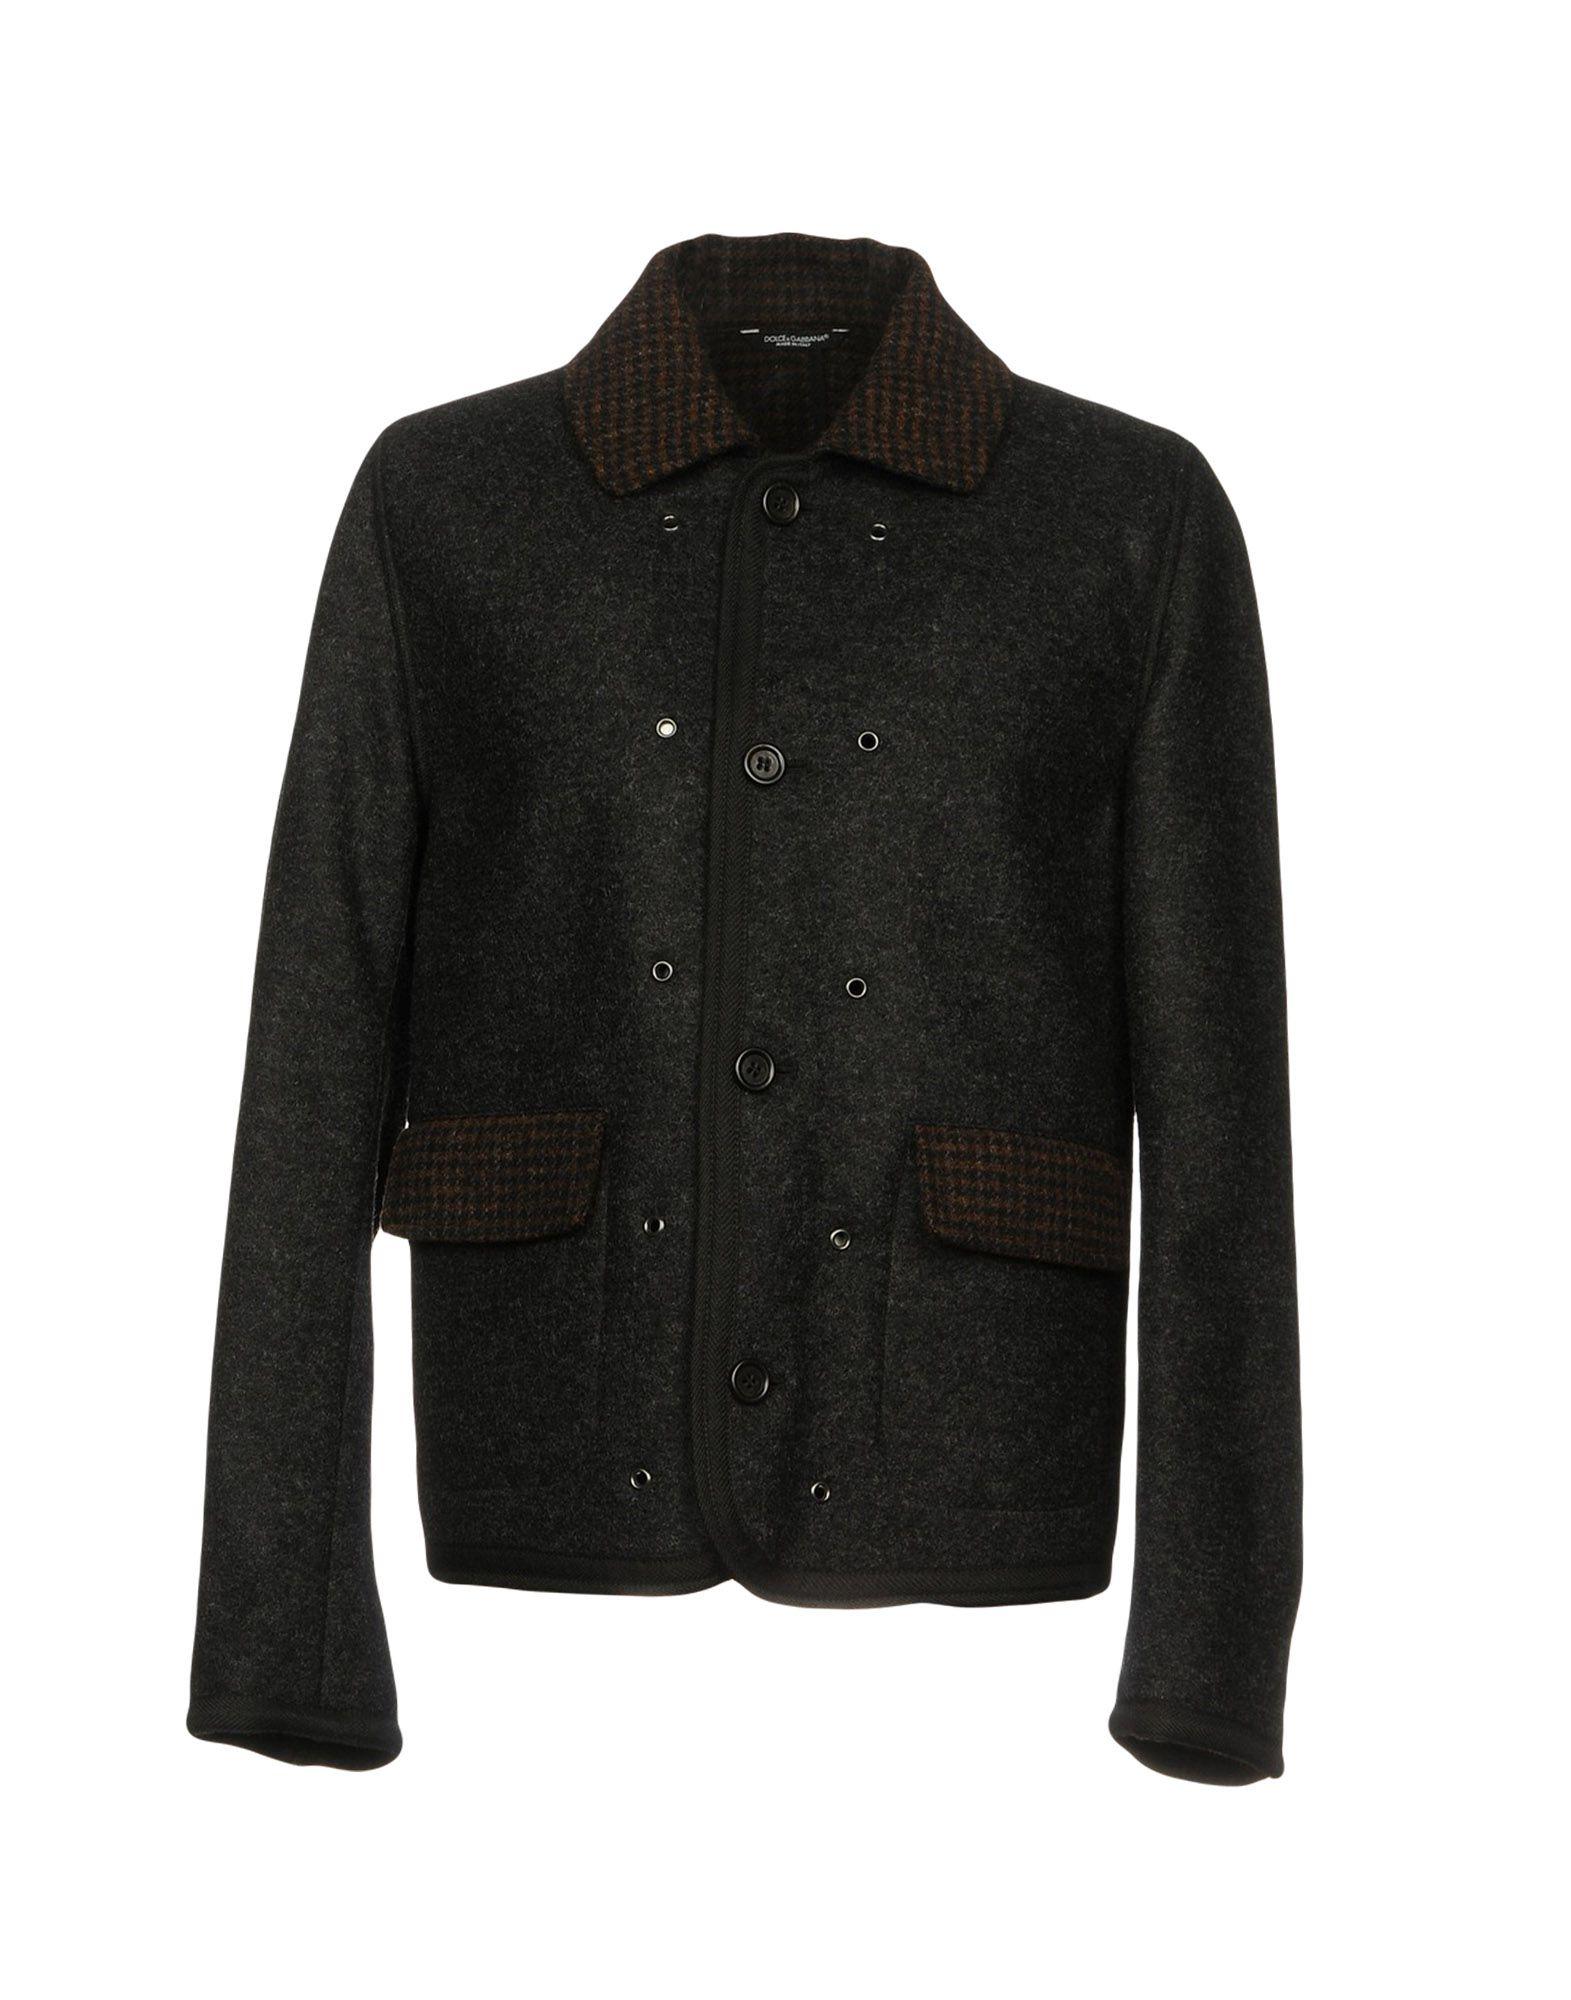 DOLCE & GABBANA Куртка одежда из кожи dolce gabbana g9z03l fult6 dolce